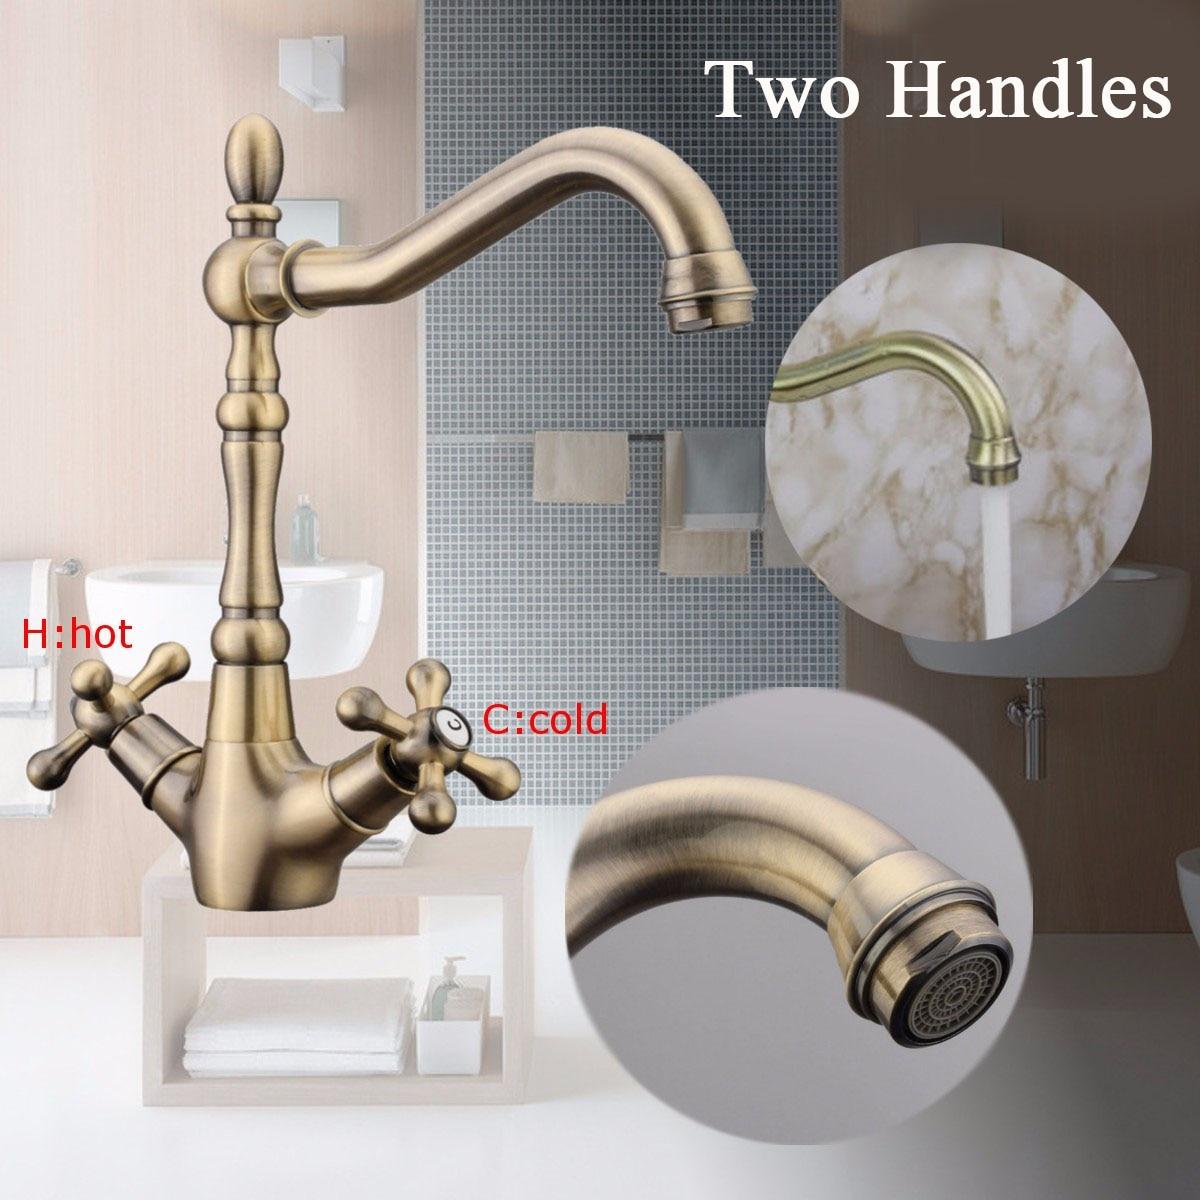 Xueqin Antique Bronze Copper Bathroom Double Handle Kitchen Basin Water Faucet 360Rotation Tap Sink Washbasin Spout Mixer Taps